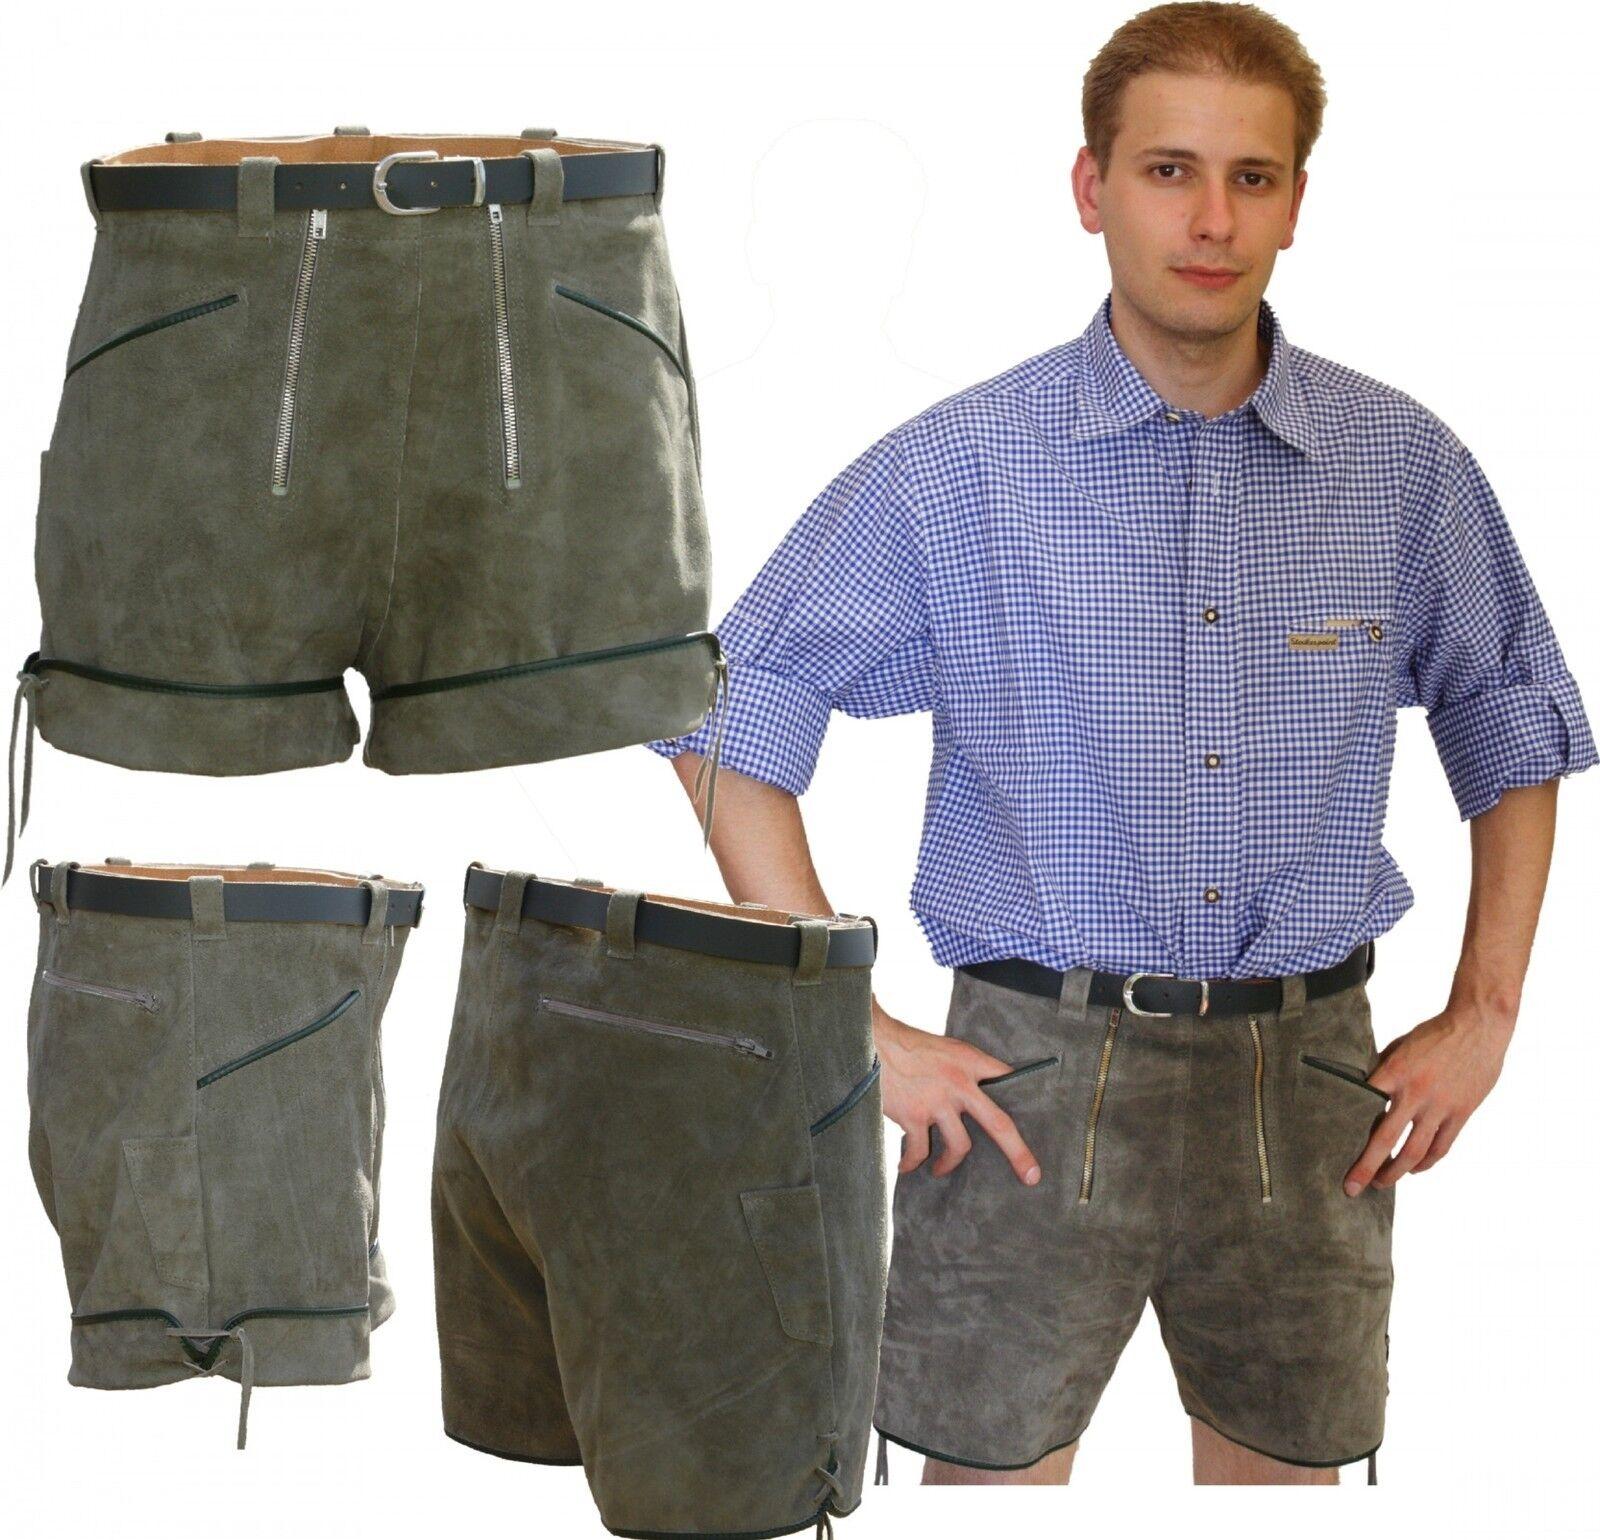 Kurze Lederhose Ledershorts Gürtellederhose Hose + 2 RV